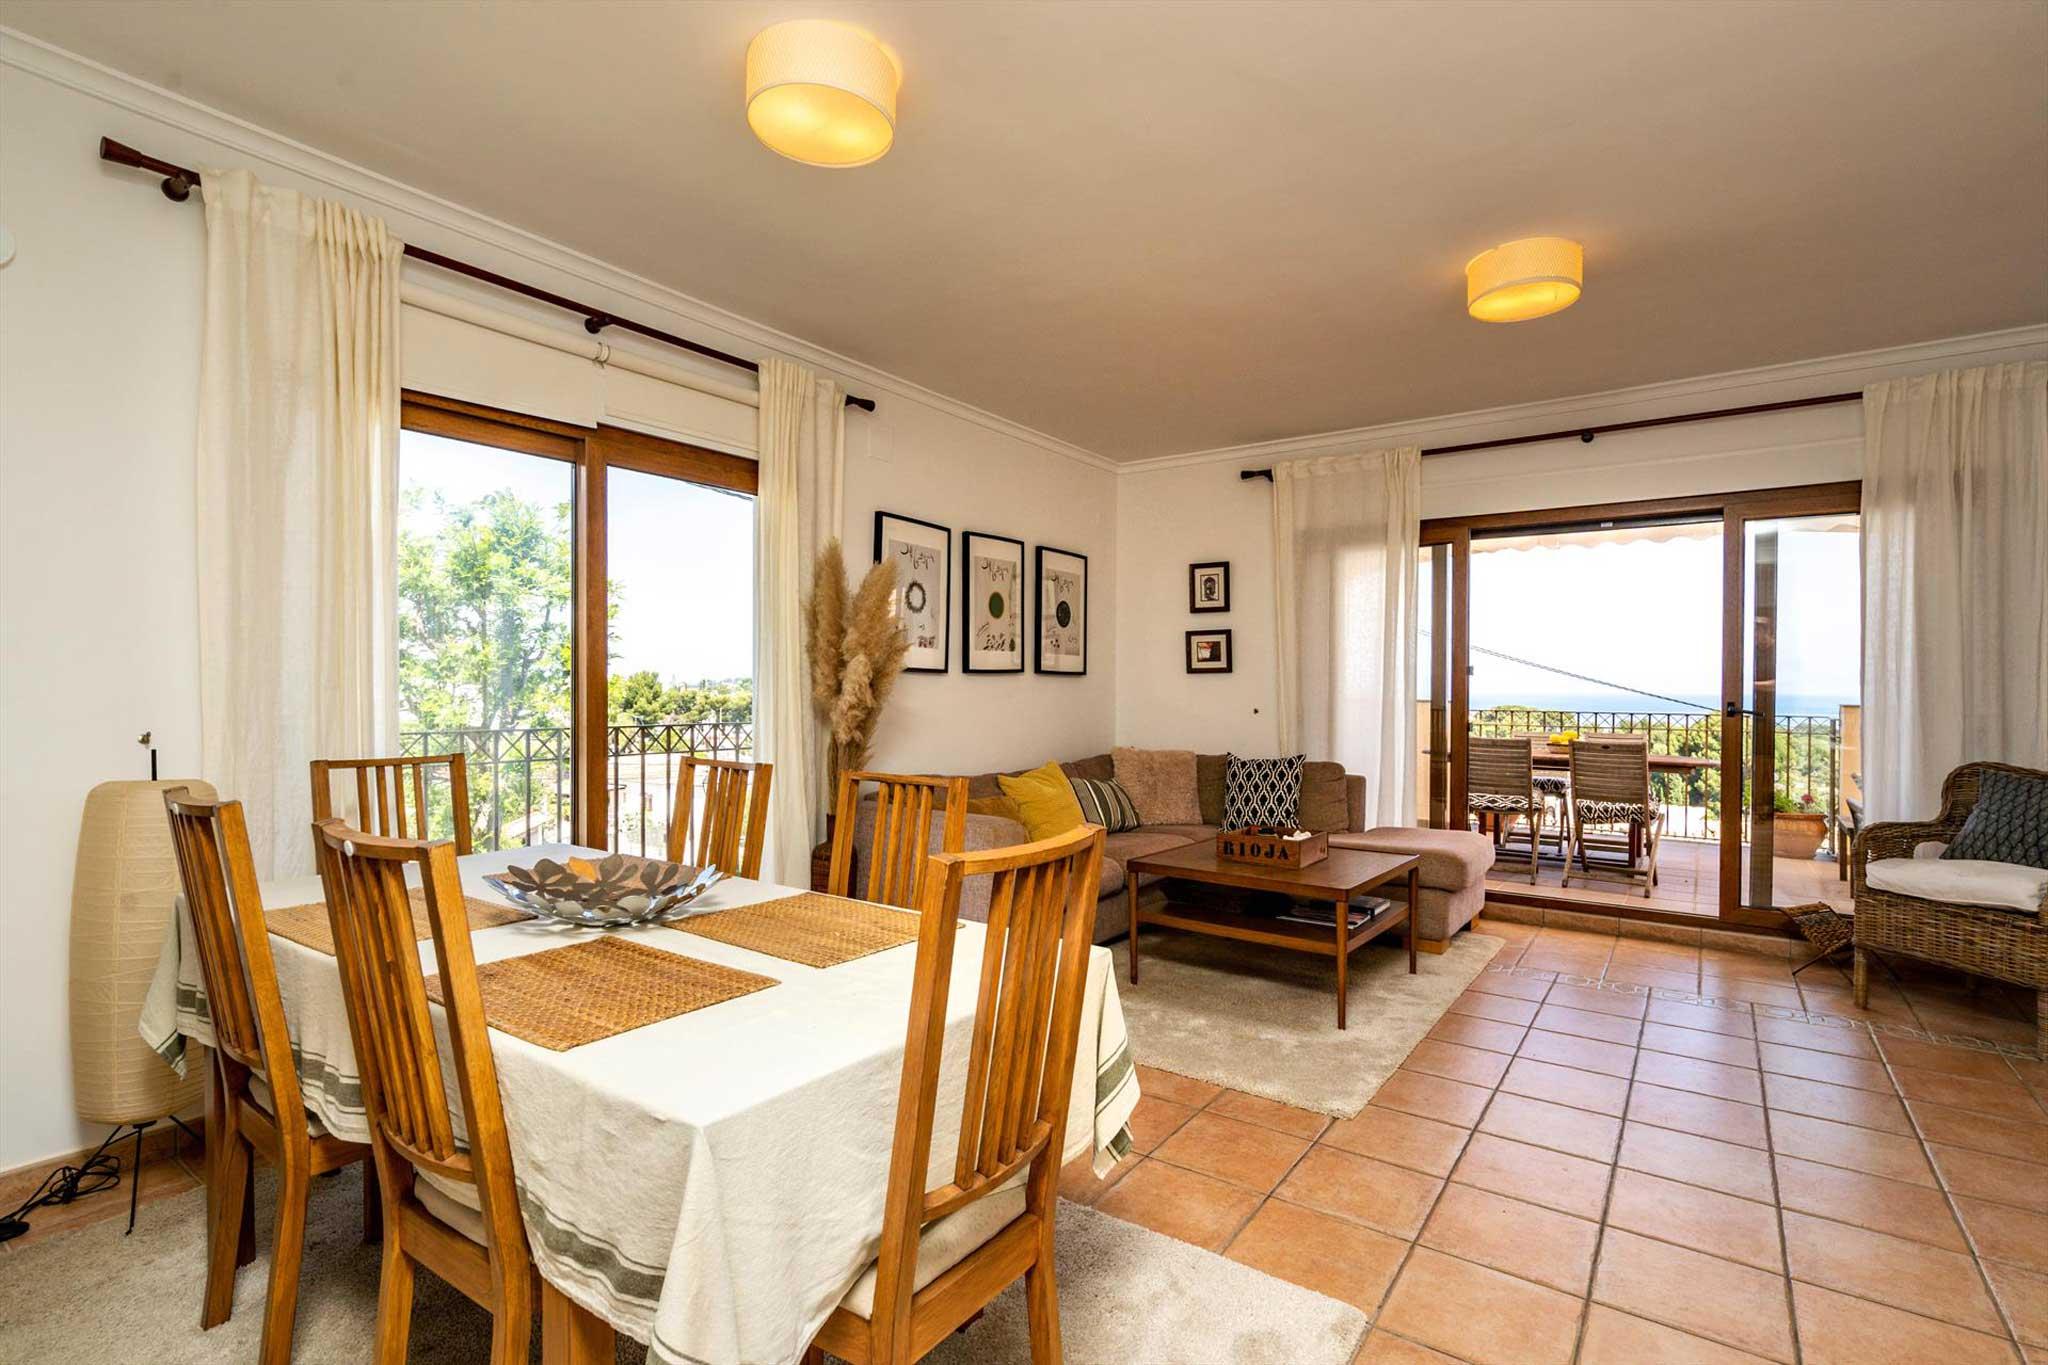 Alquiler vacacional casa Denia – Quality Rent a Villa